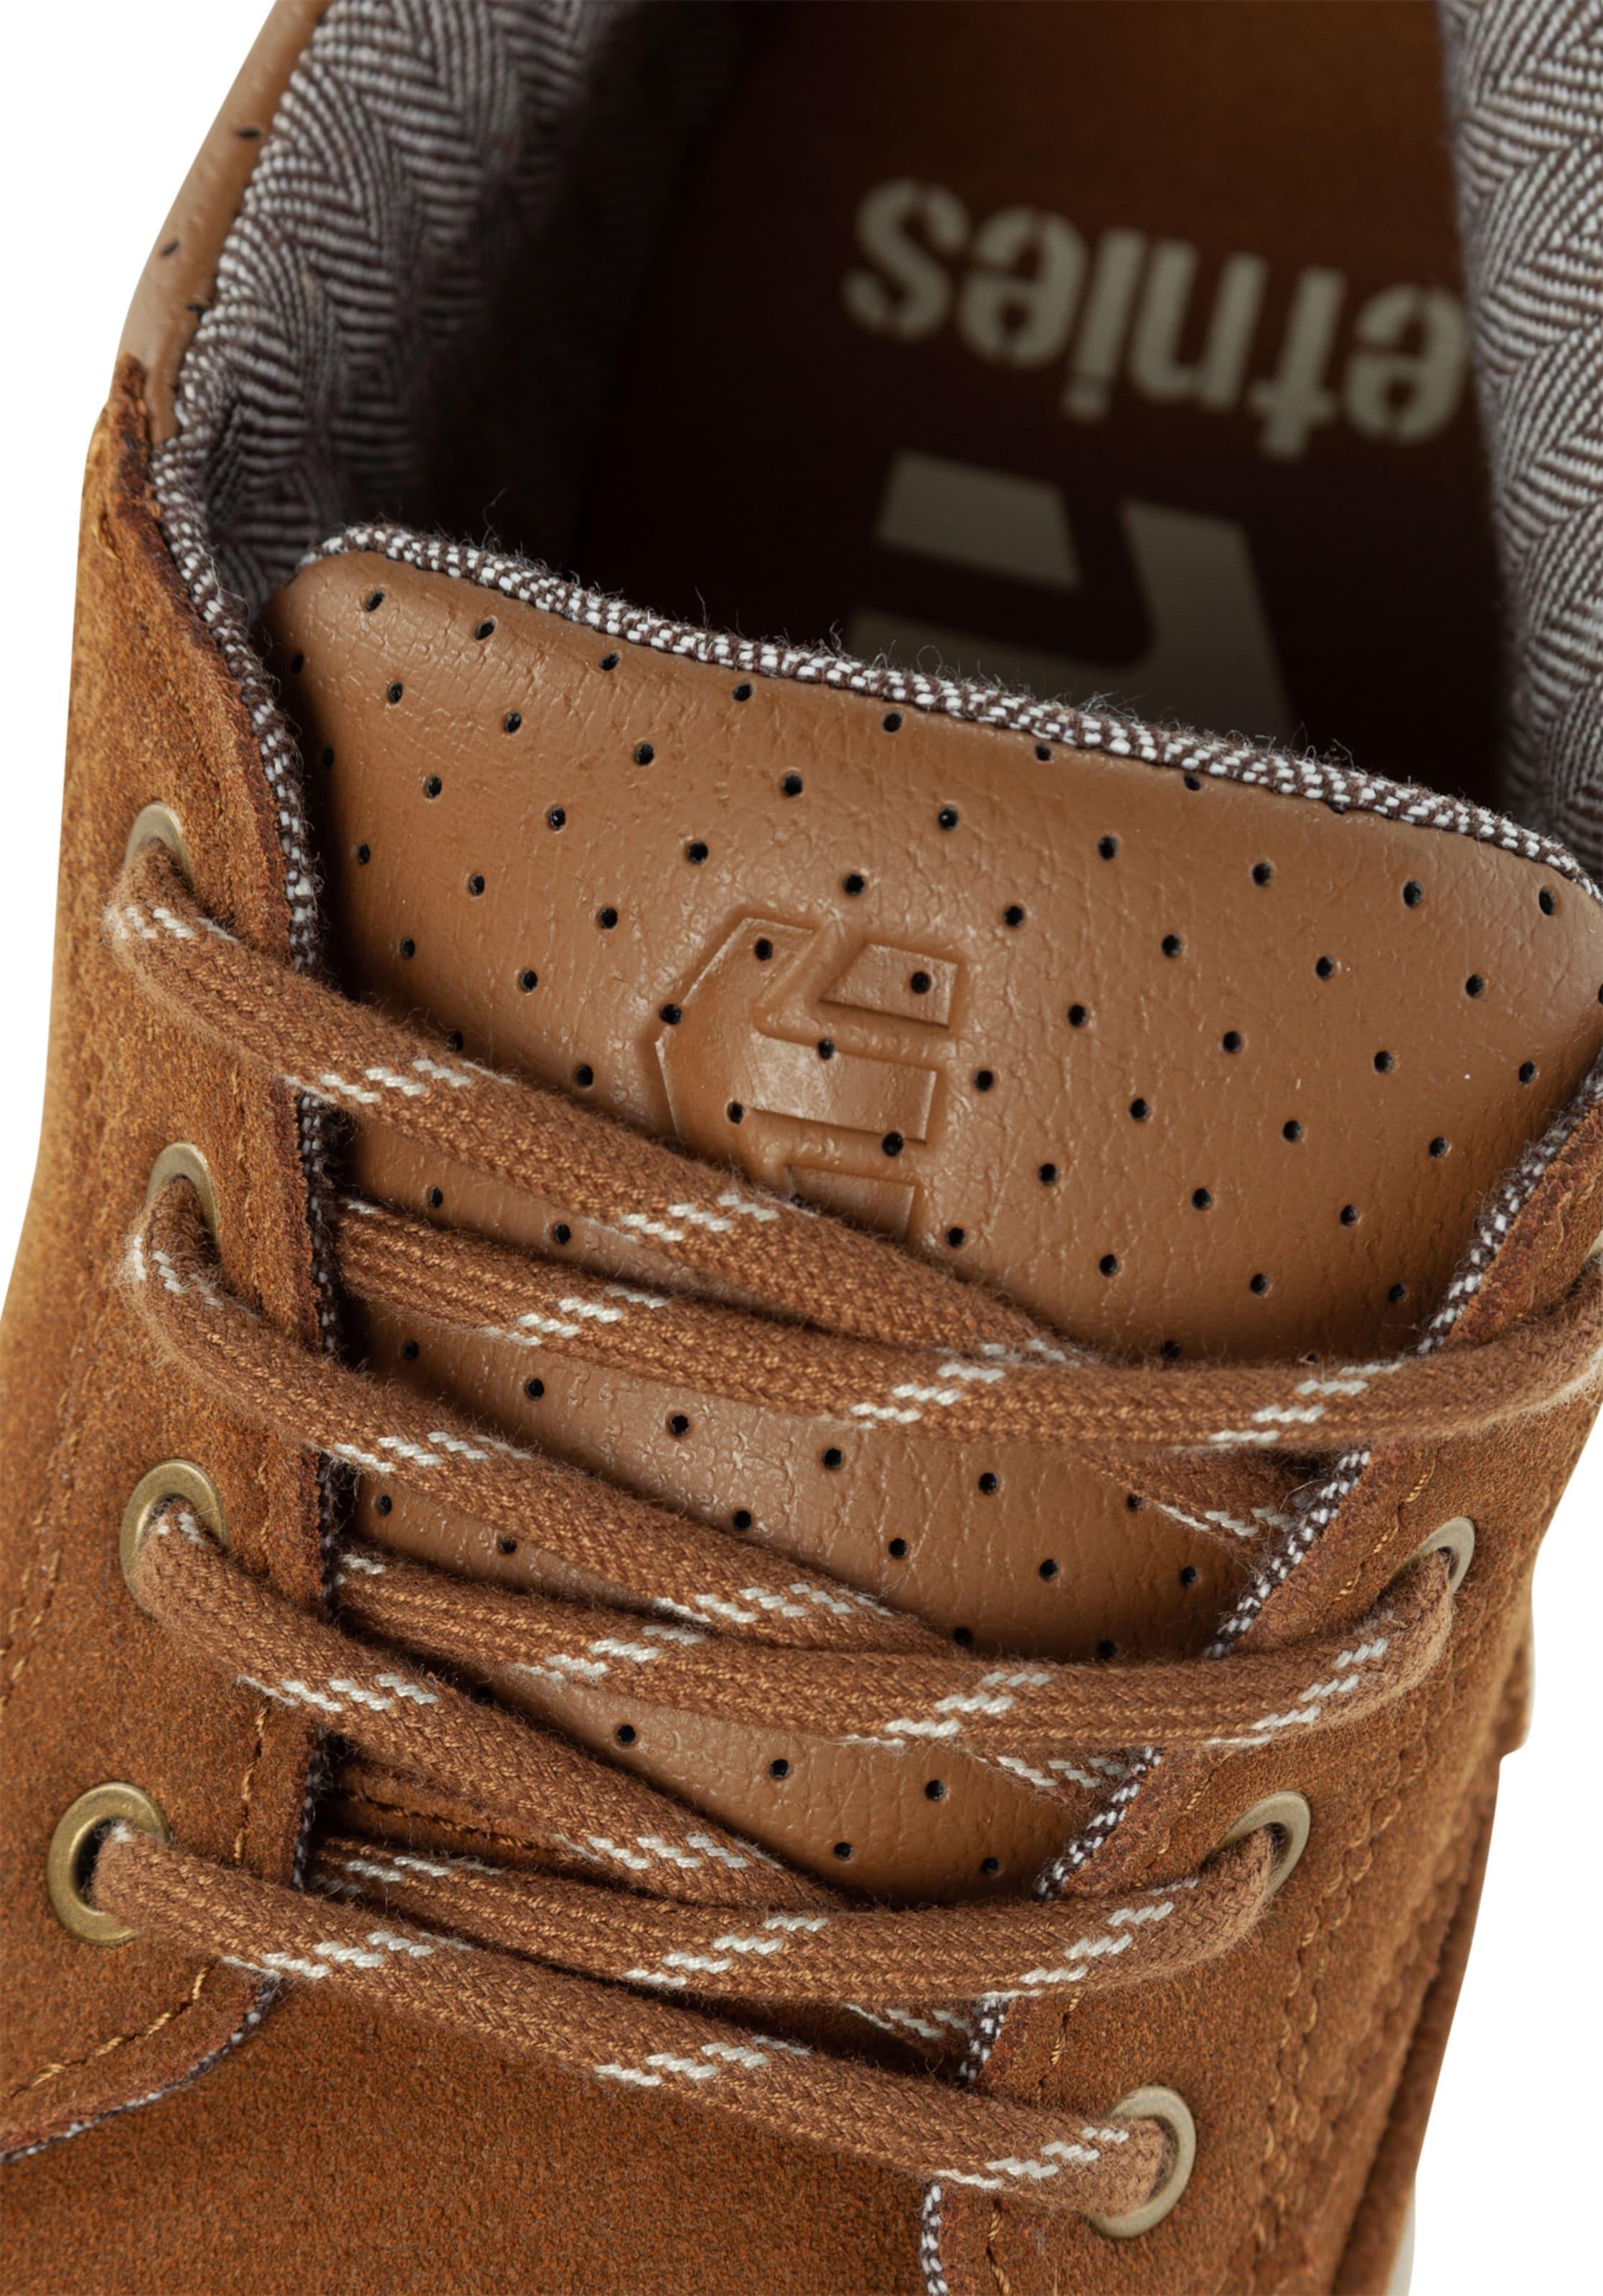 'macallan' In BeigeBraun Etnies In BeigeBraun Sneaker Sneaker Etnies 'macallan' orCWBdxe